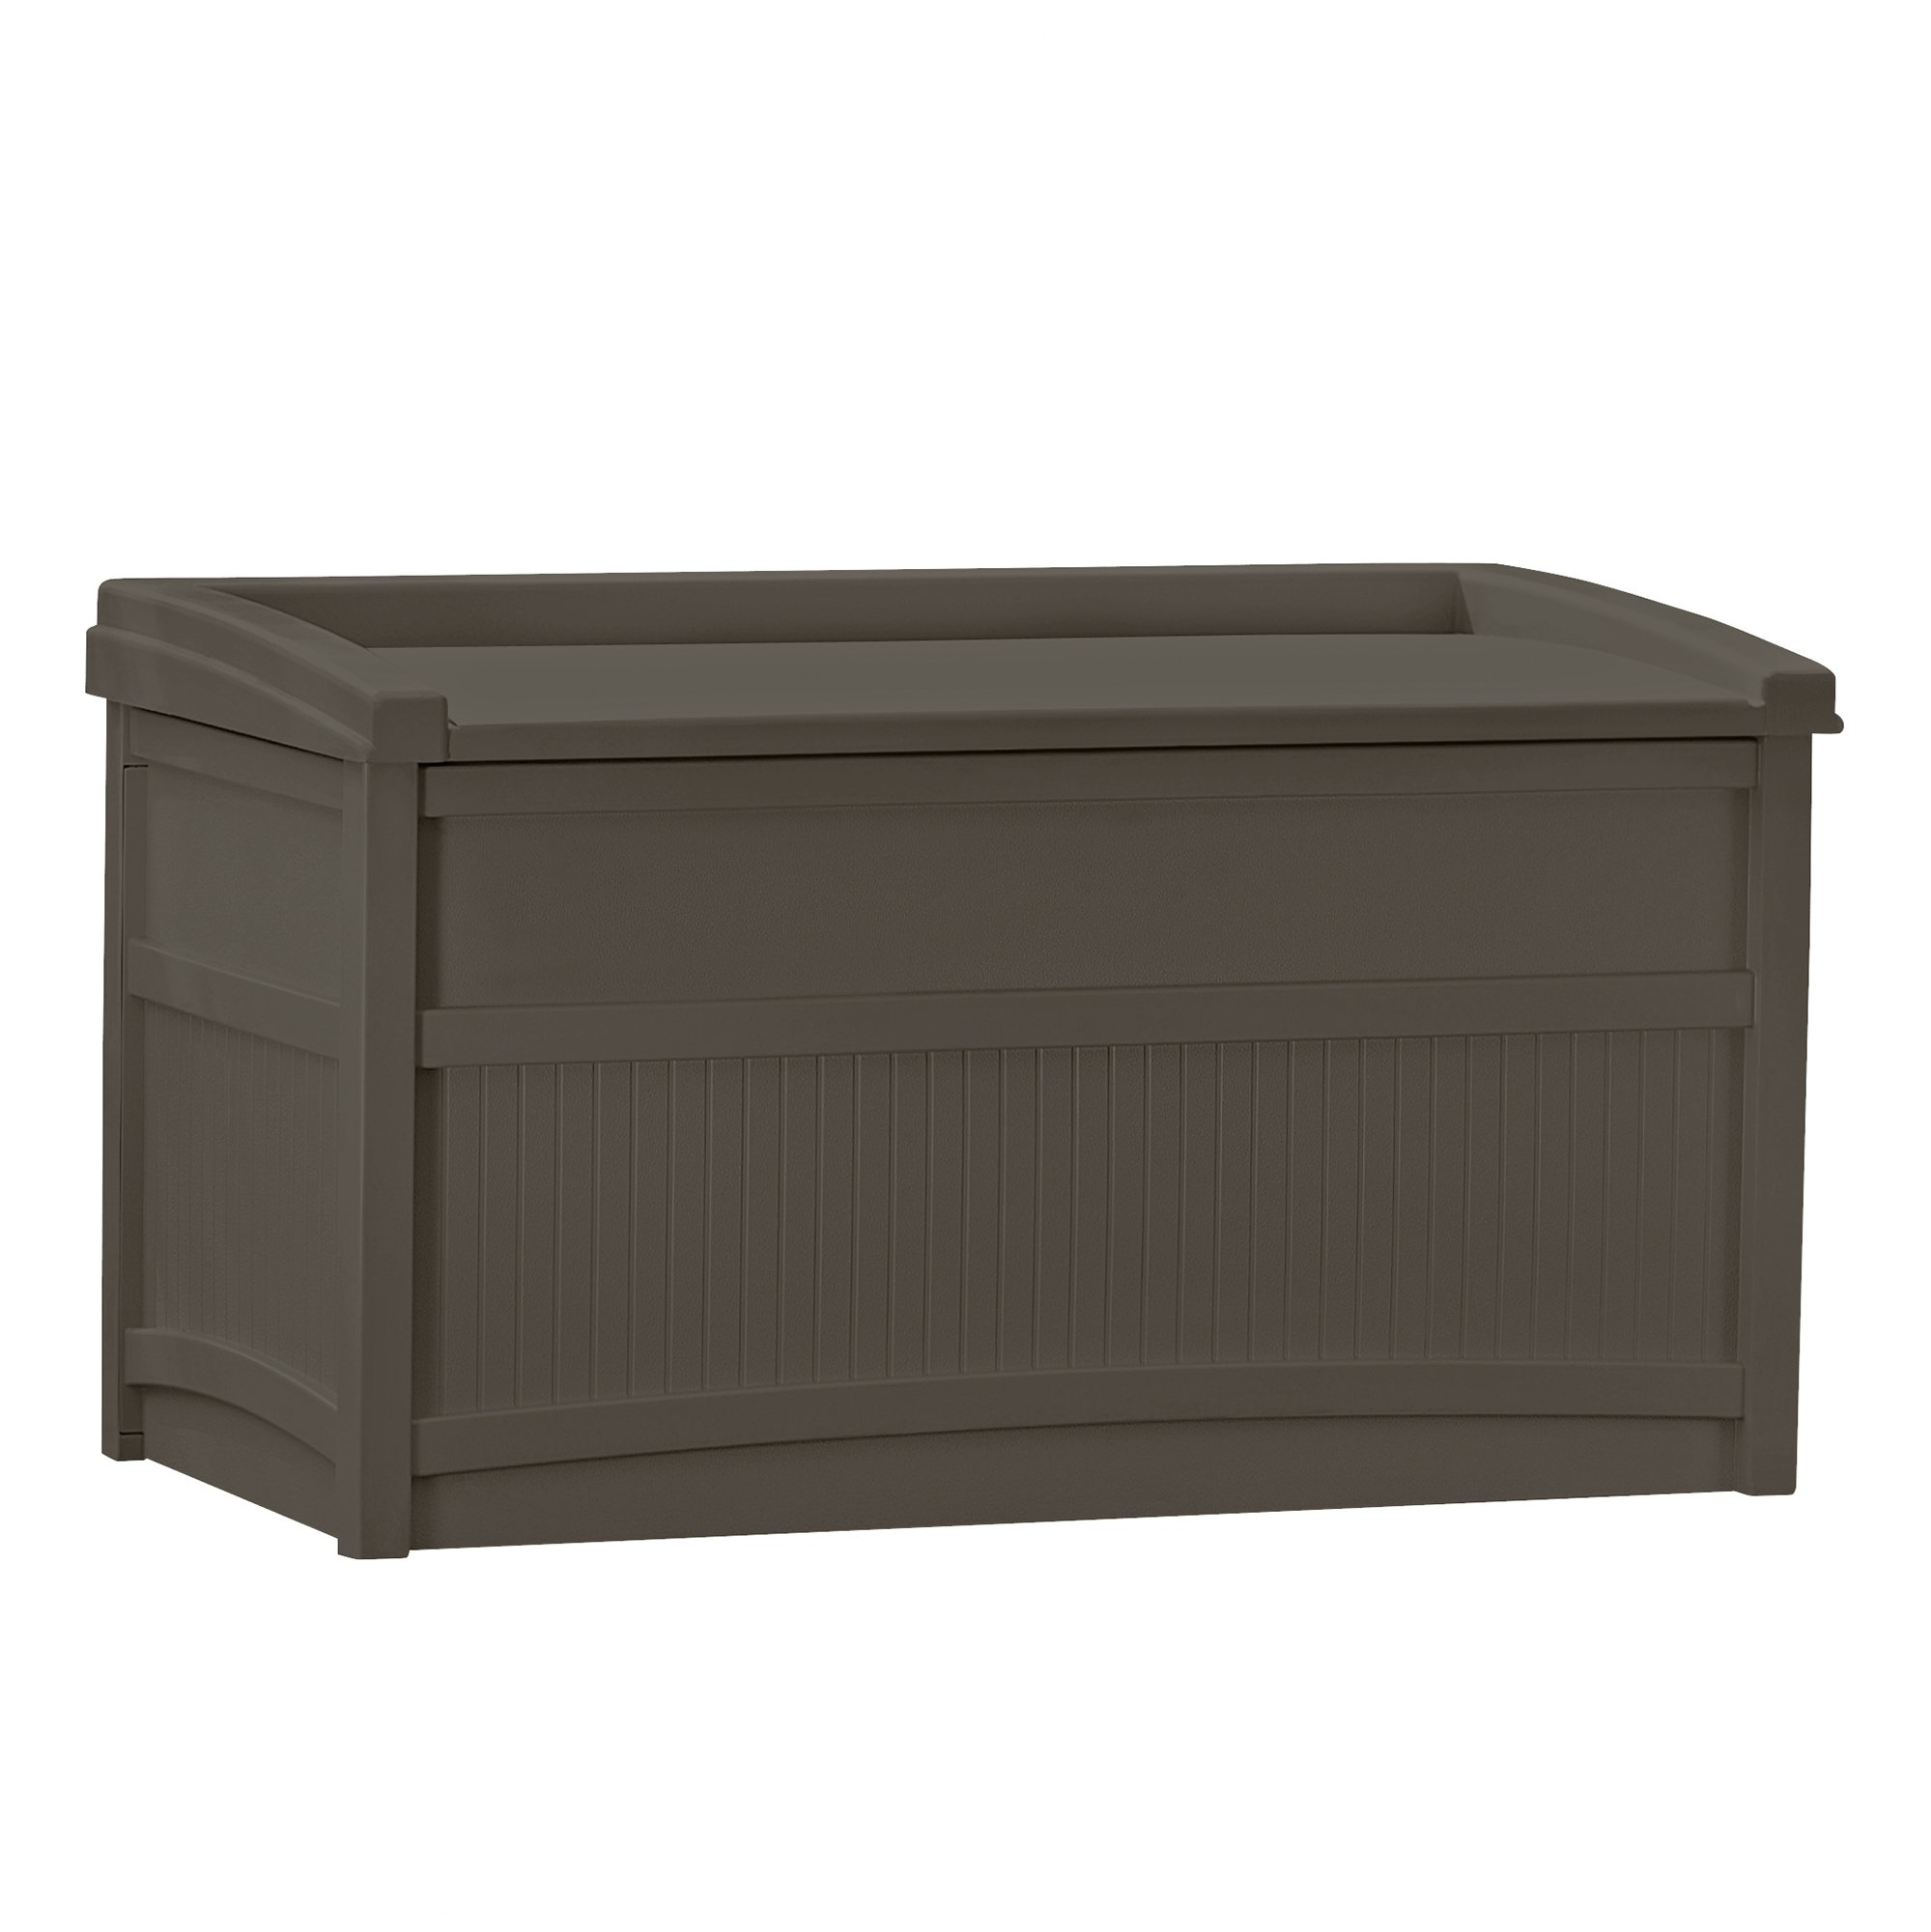 Suncast DB5500J 50-Gallon Deck Box with Seat